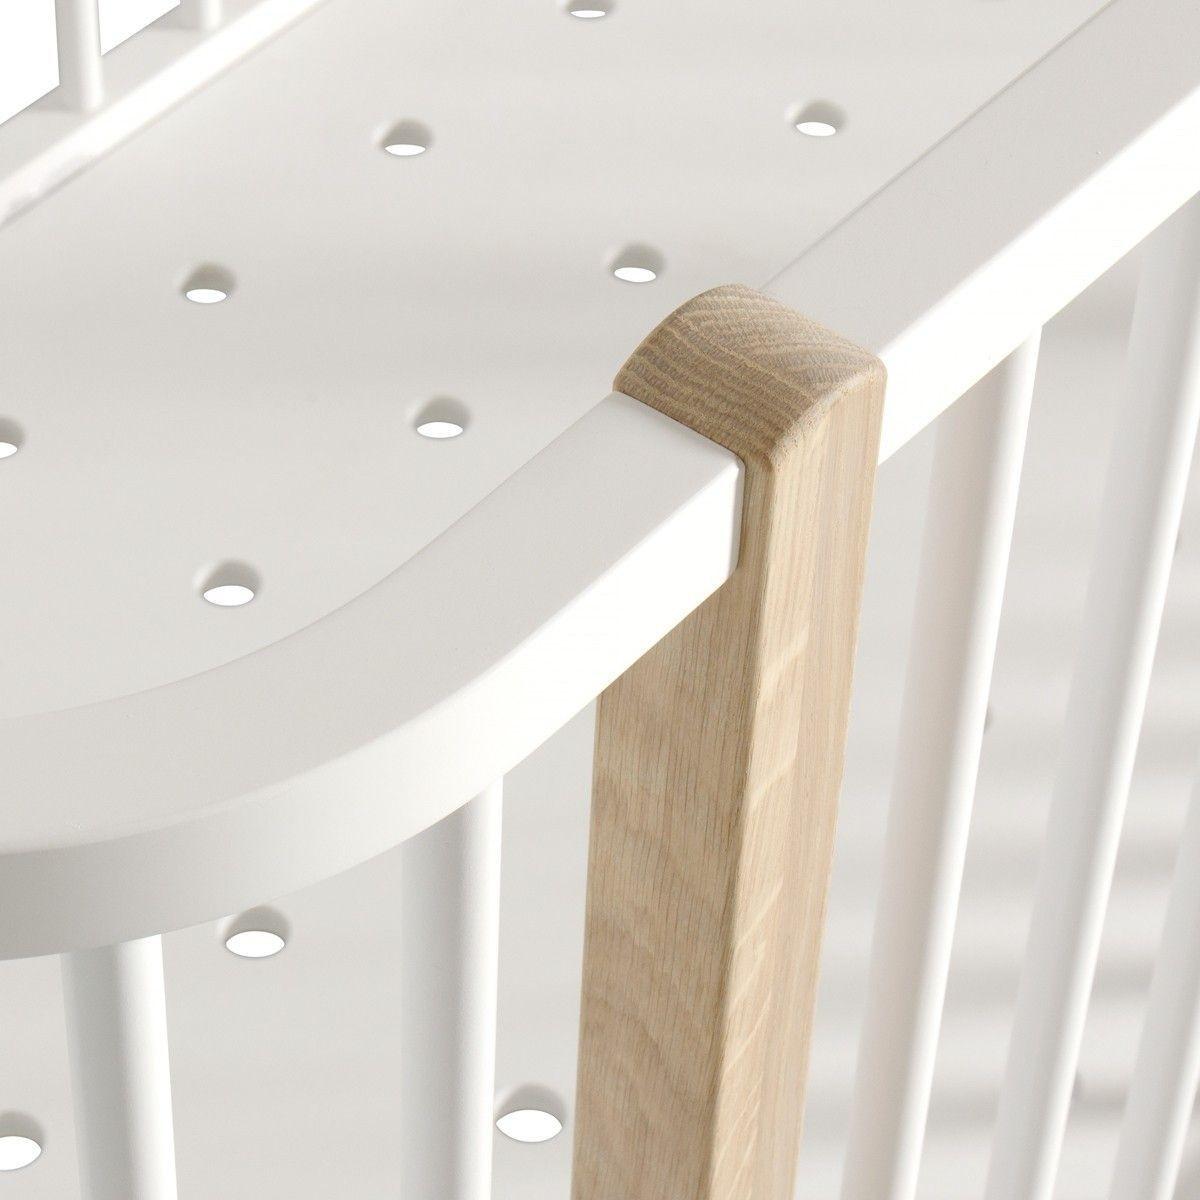 wood babybett umbaubett 70x140 cm oliver furniture. Black Bedroom Furniture Sets. Home Design Ideas